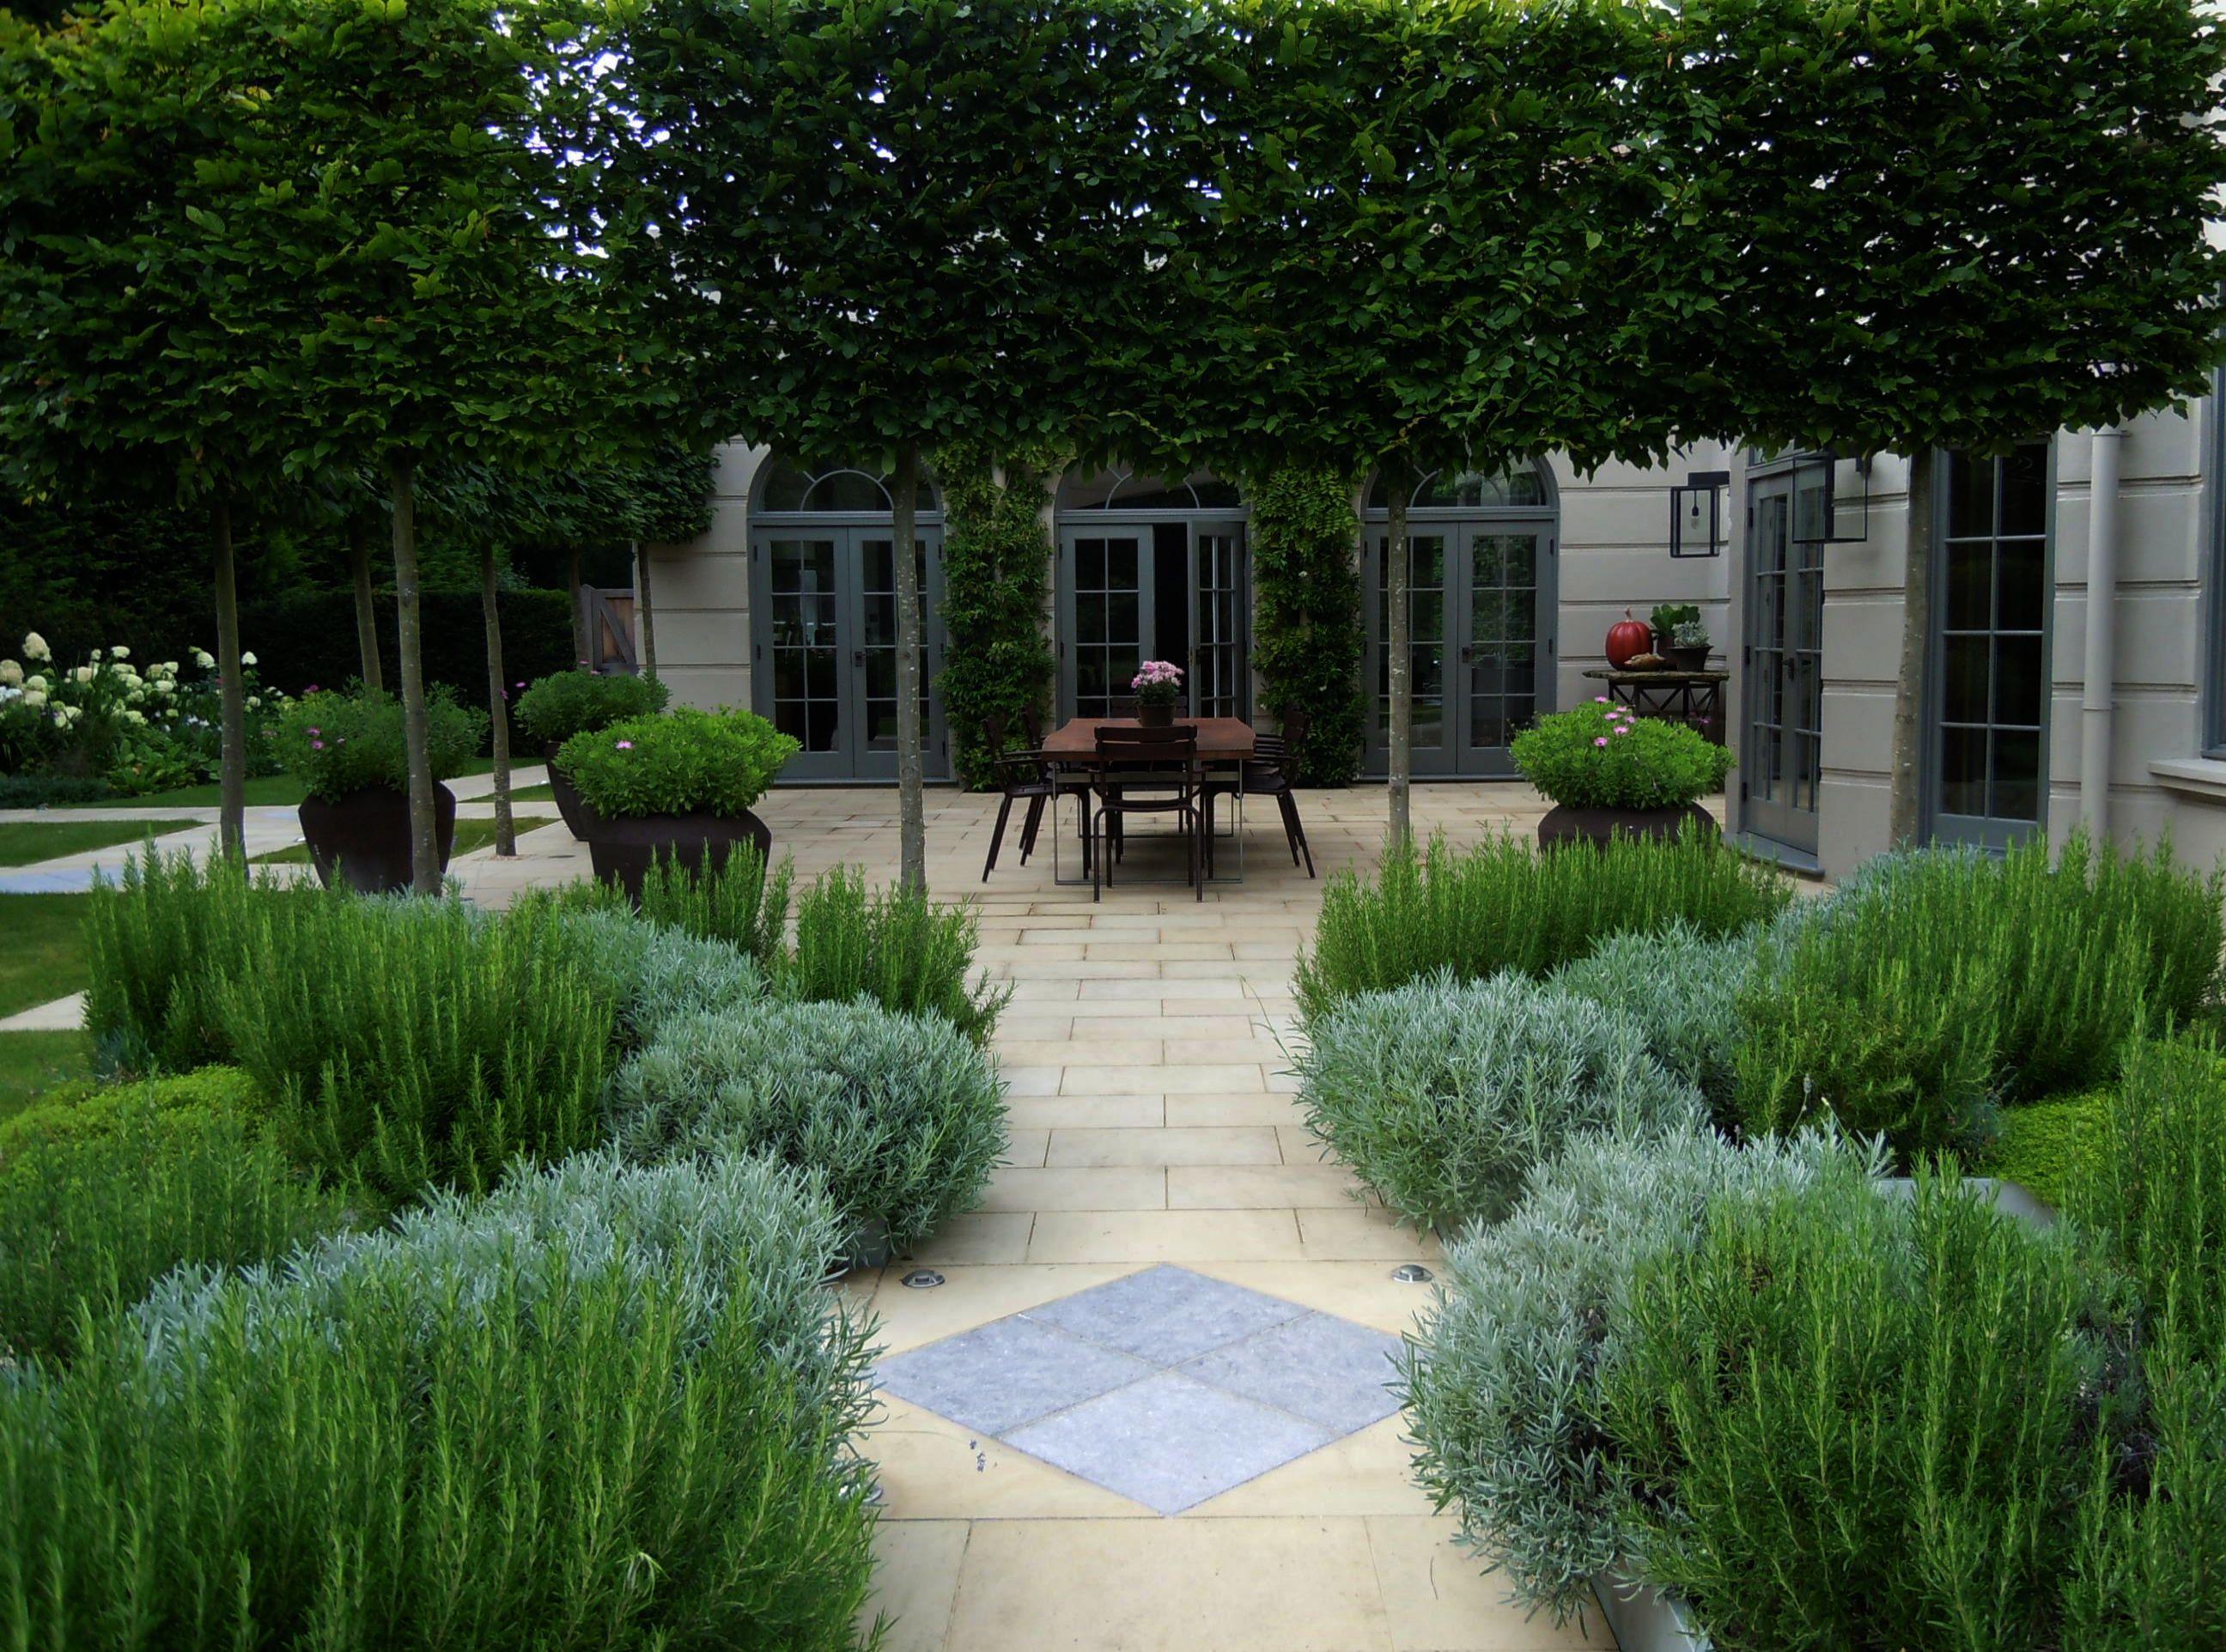 Landscape Gardening Jobs Milton Keynes Whether Landscape Gardening Northern Ireland Najmat Al Sahraa Landsca Shade Garden Design Garden Design Outdoor Gardens